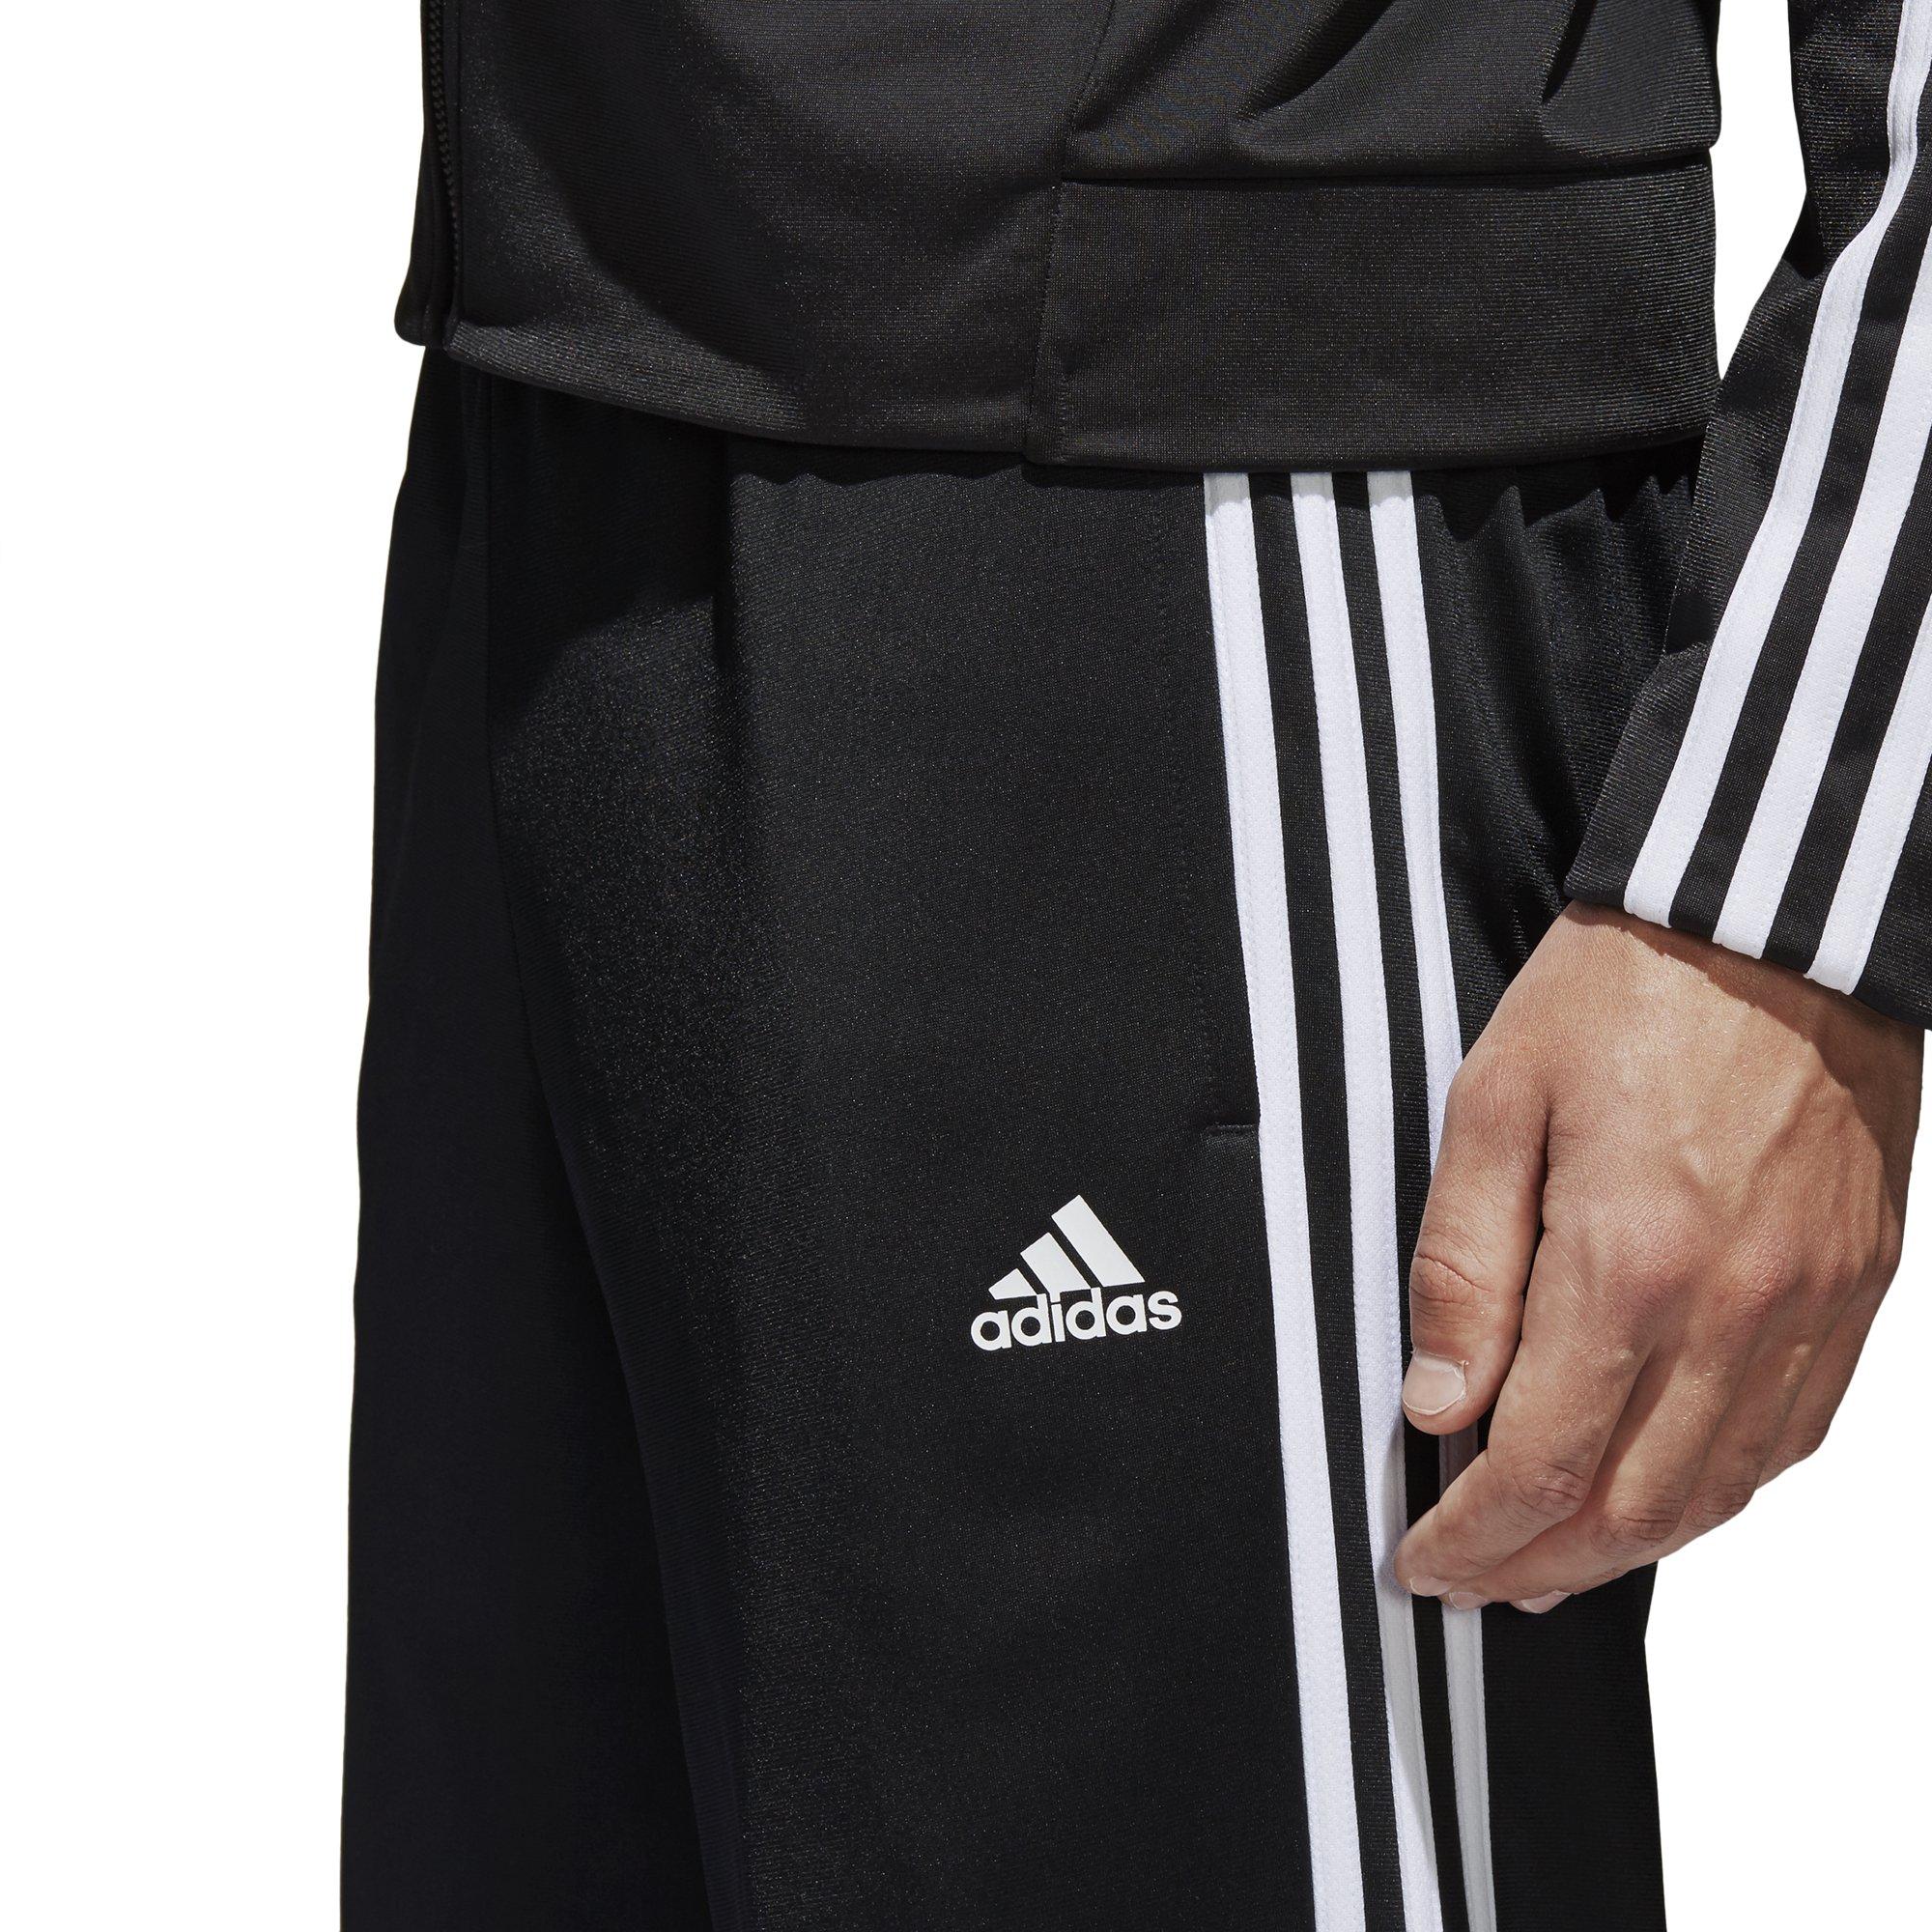 adidas Men's Athletics Essential Tricot 3-Stripe Pants, Black/White, Small by adidas (Image #7)